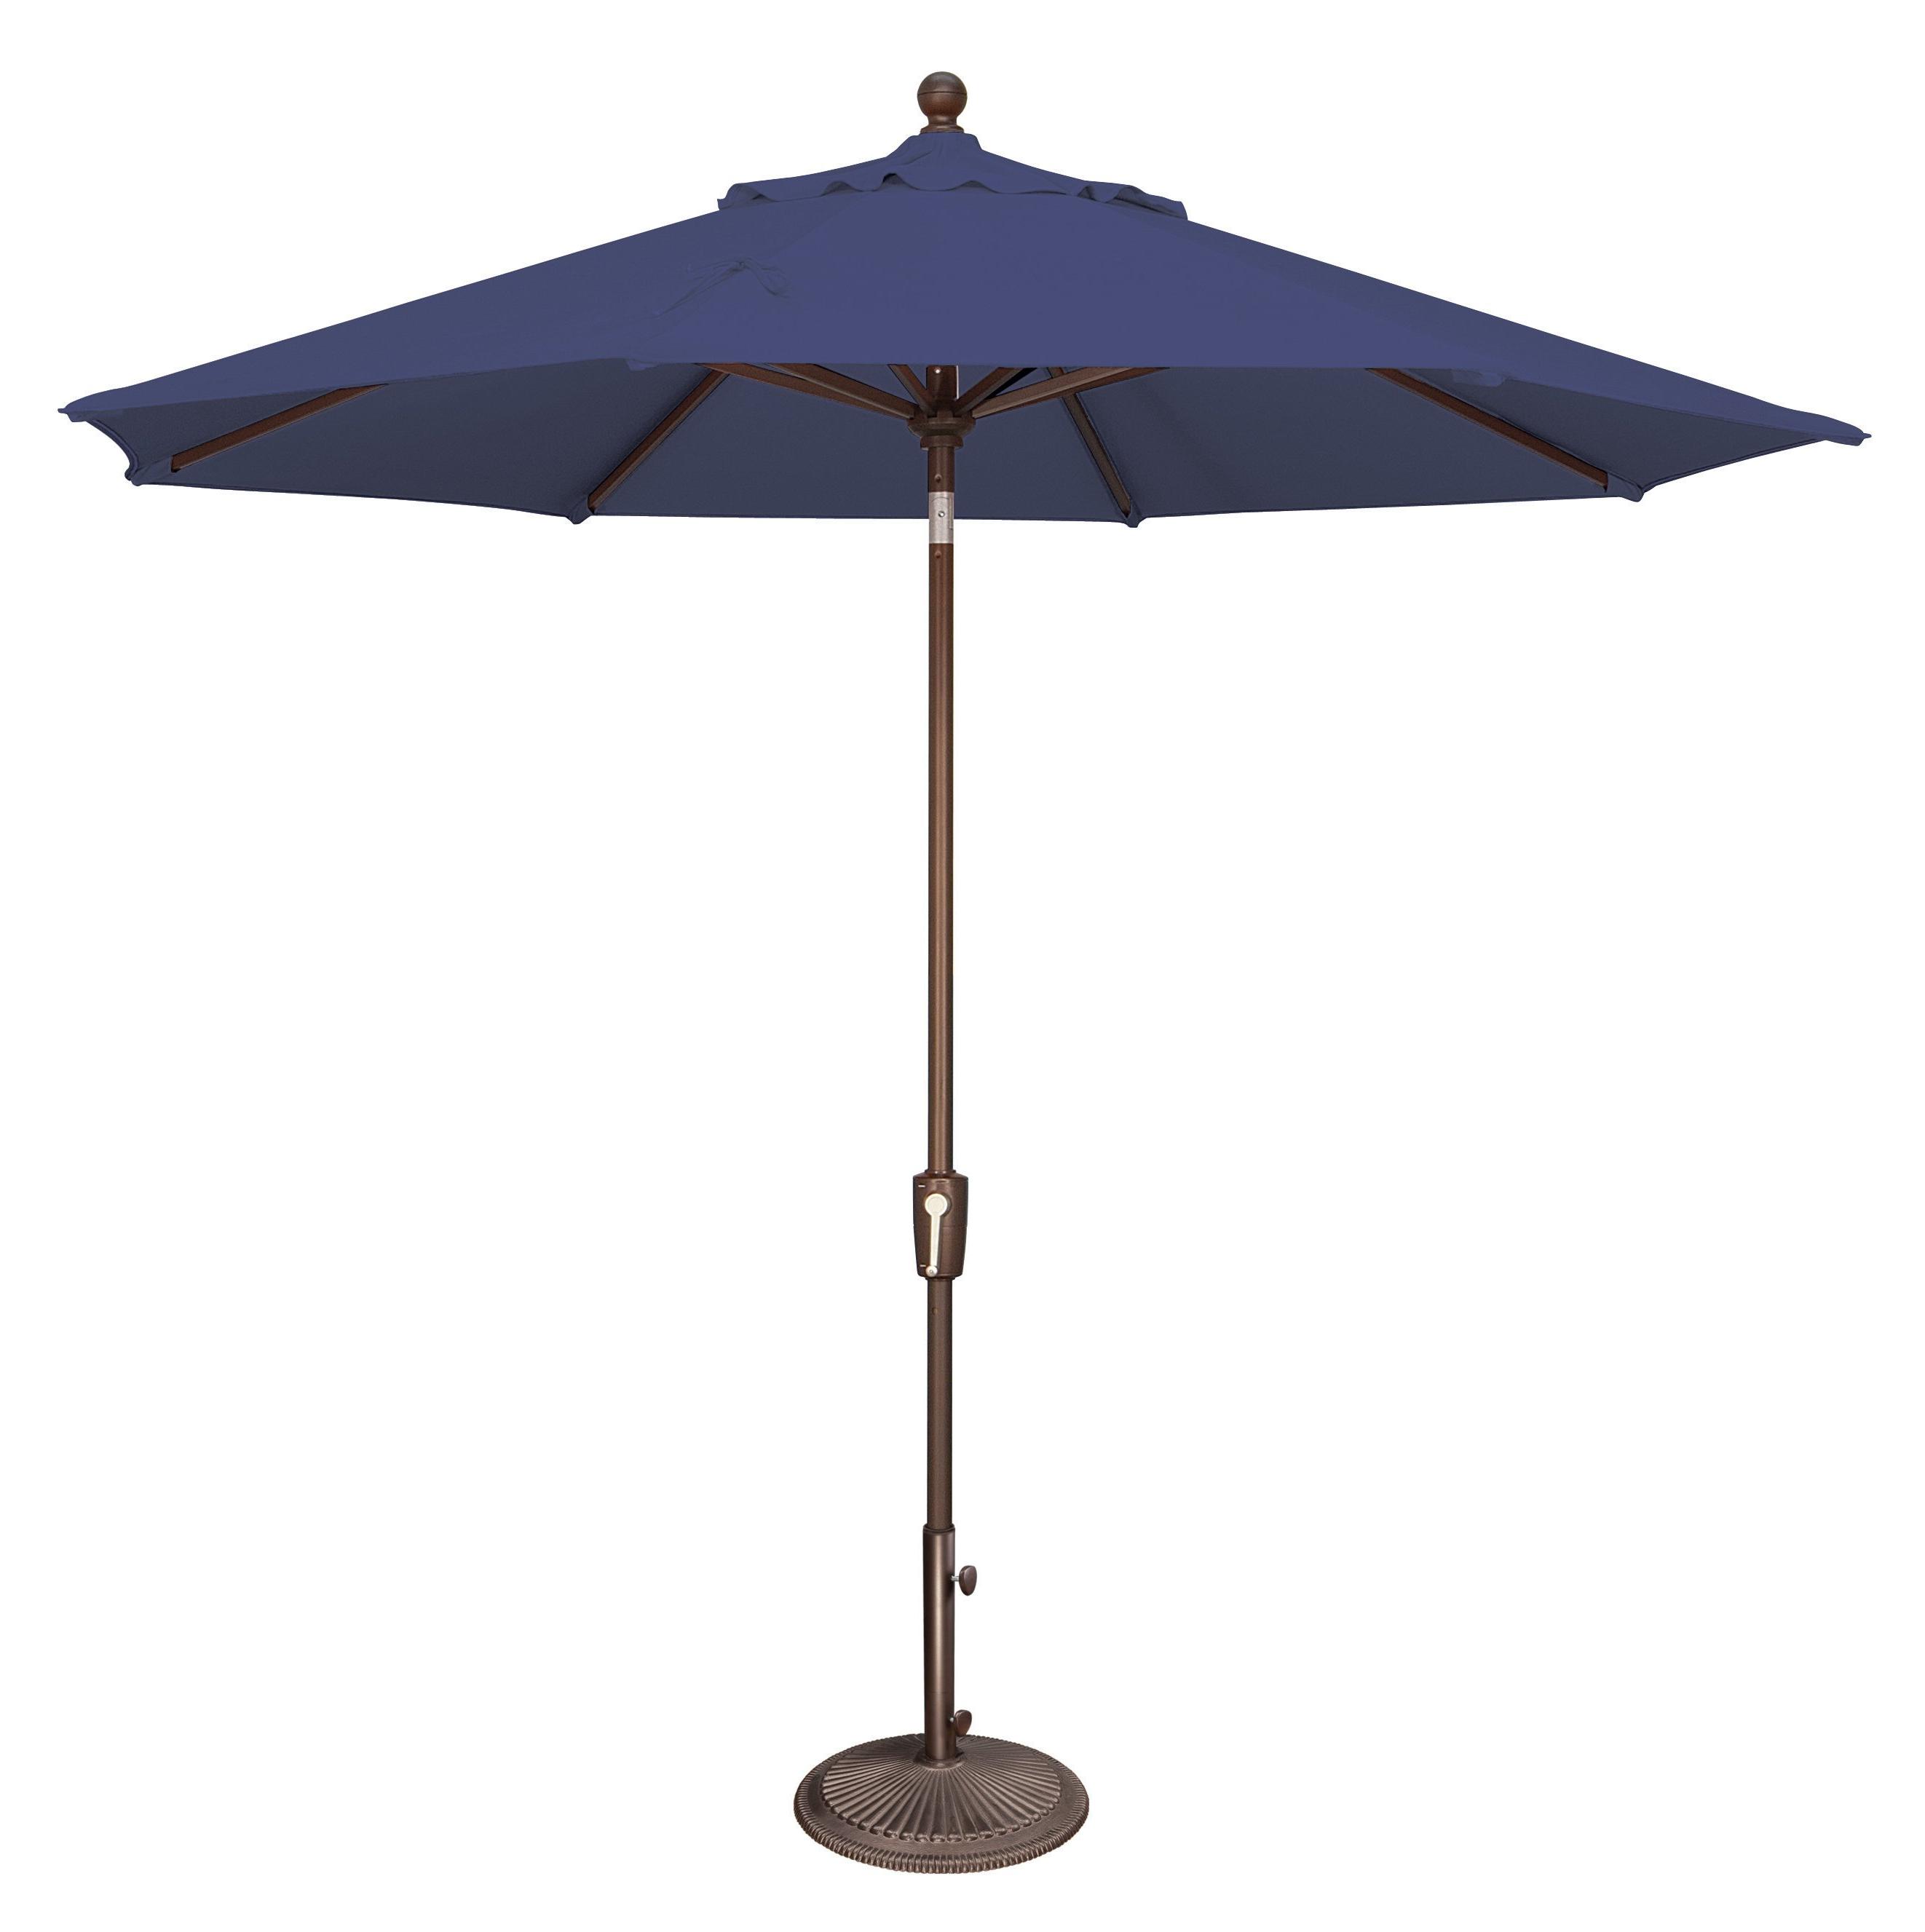 Priscilla Market Umbrellas With Favorite Launceston 9' Market Umbrella (View 5 of 20)